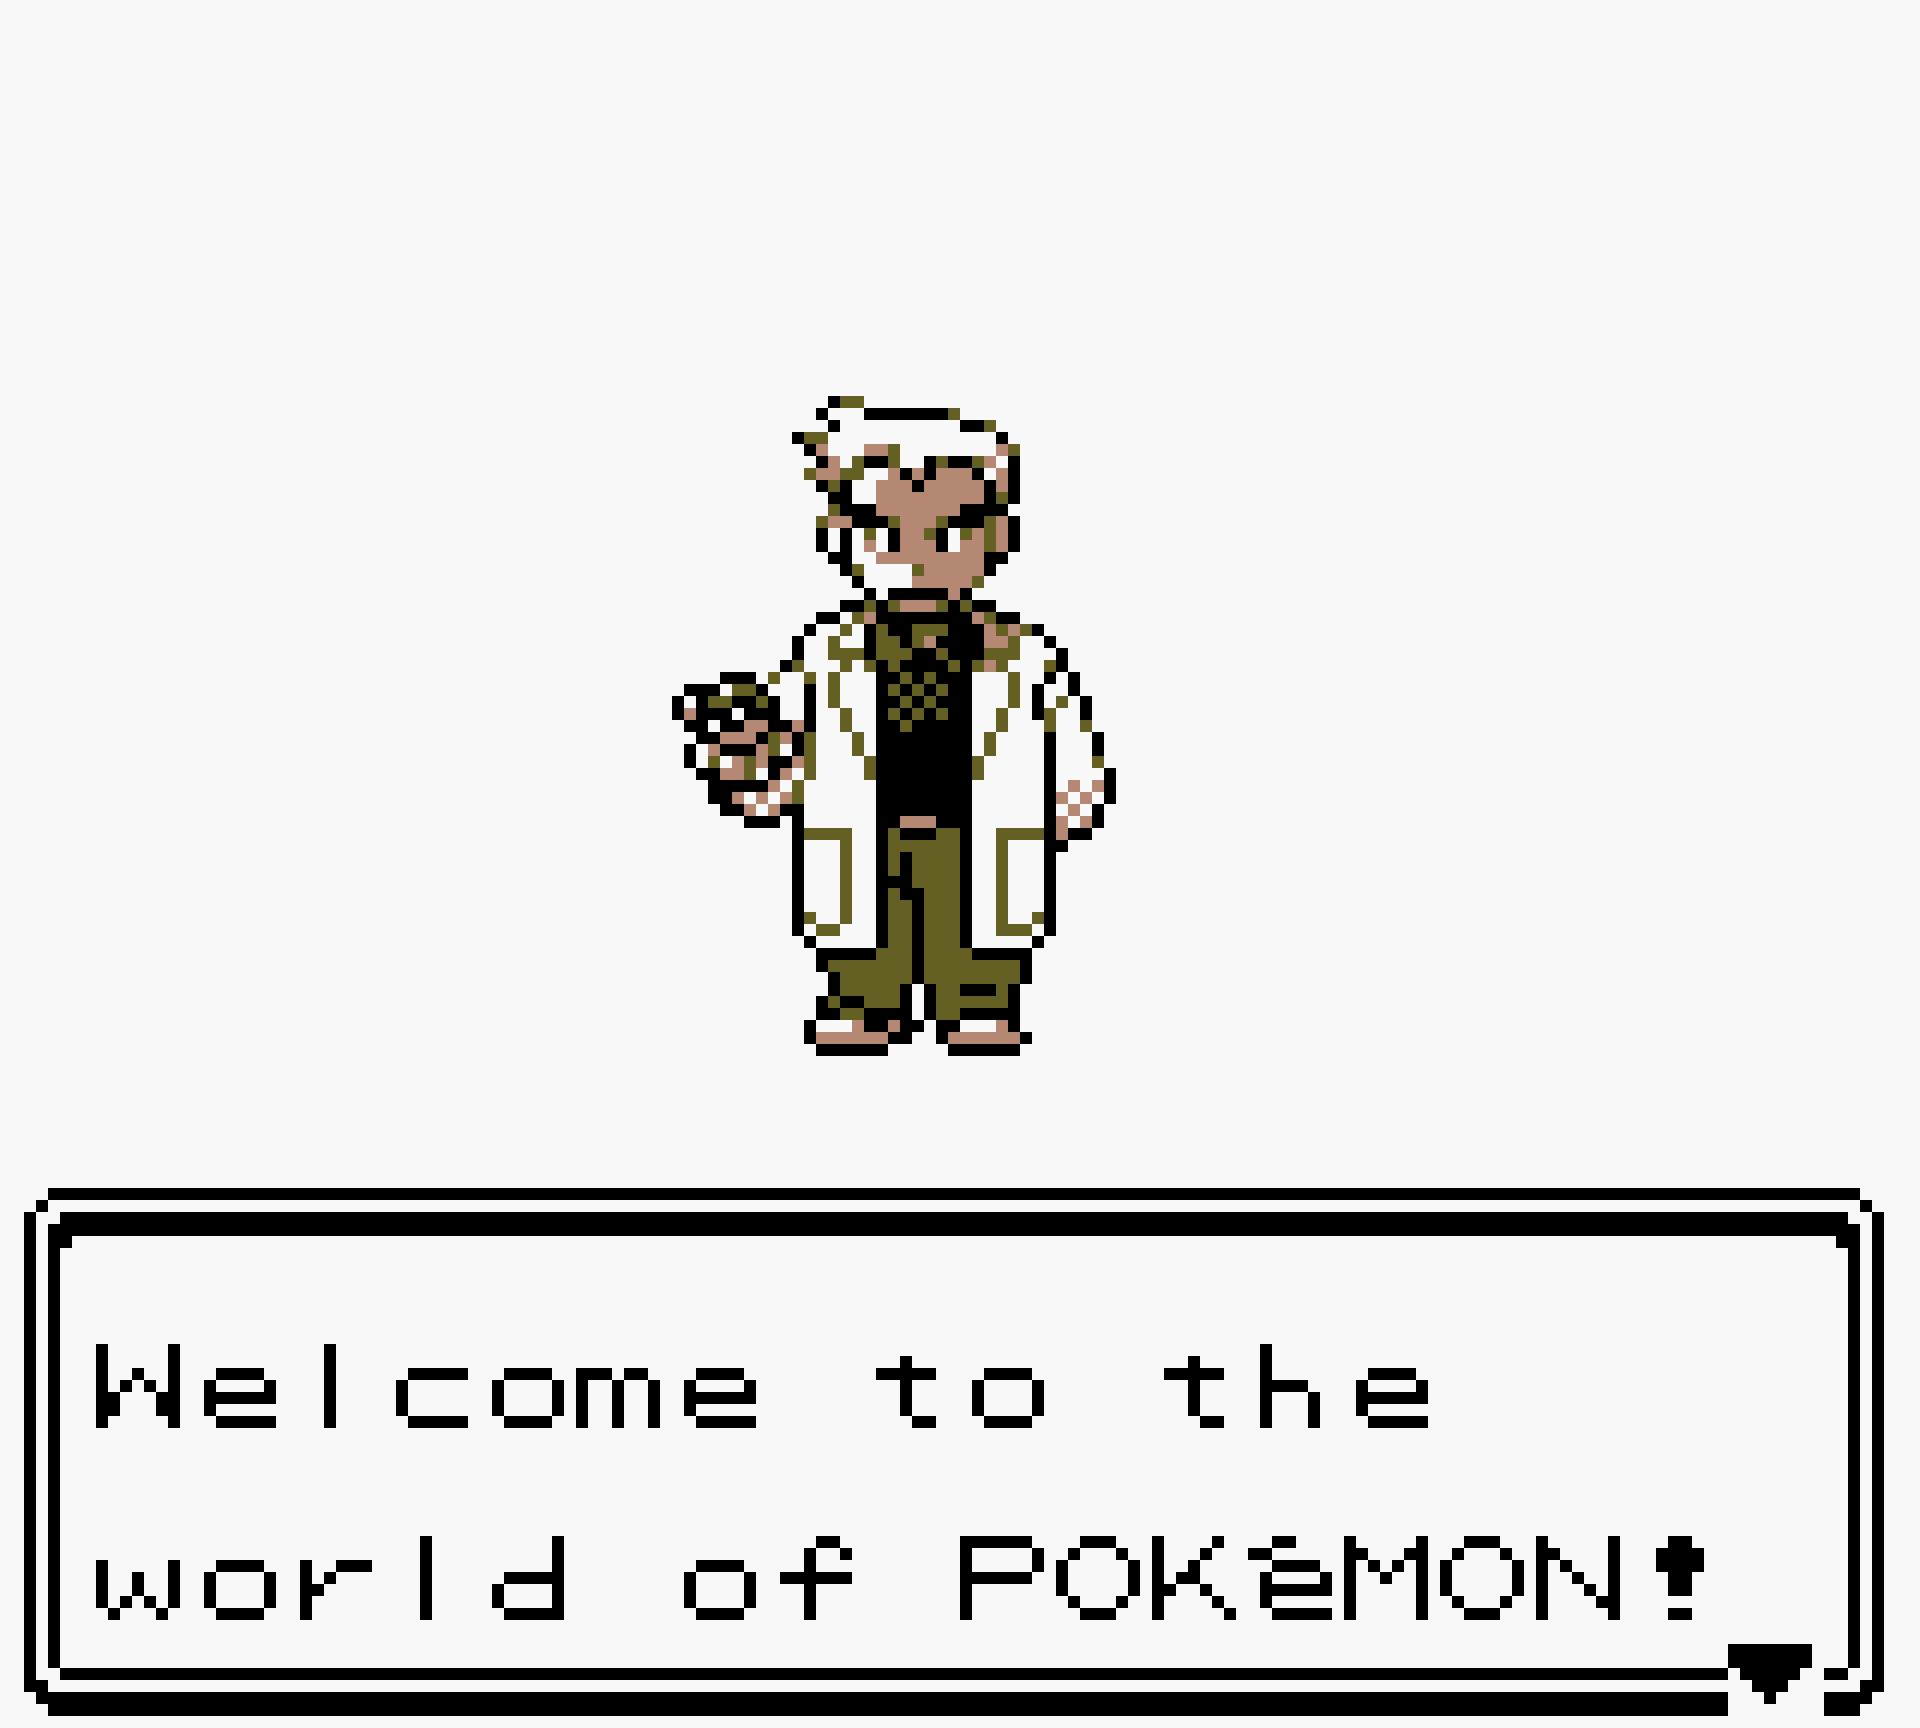 Pokemon_Crystal_Nuzlocke_2021-10-10_23.44.03.png